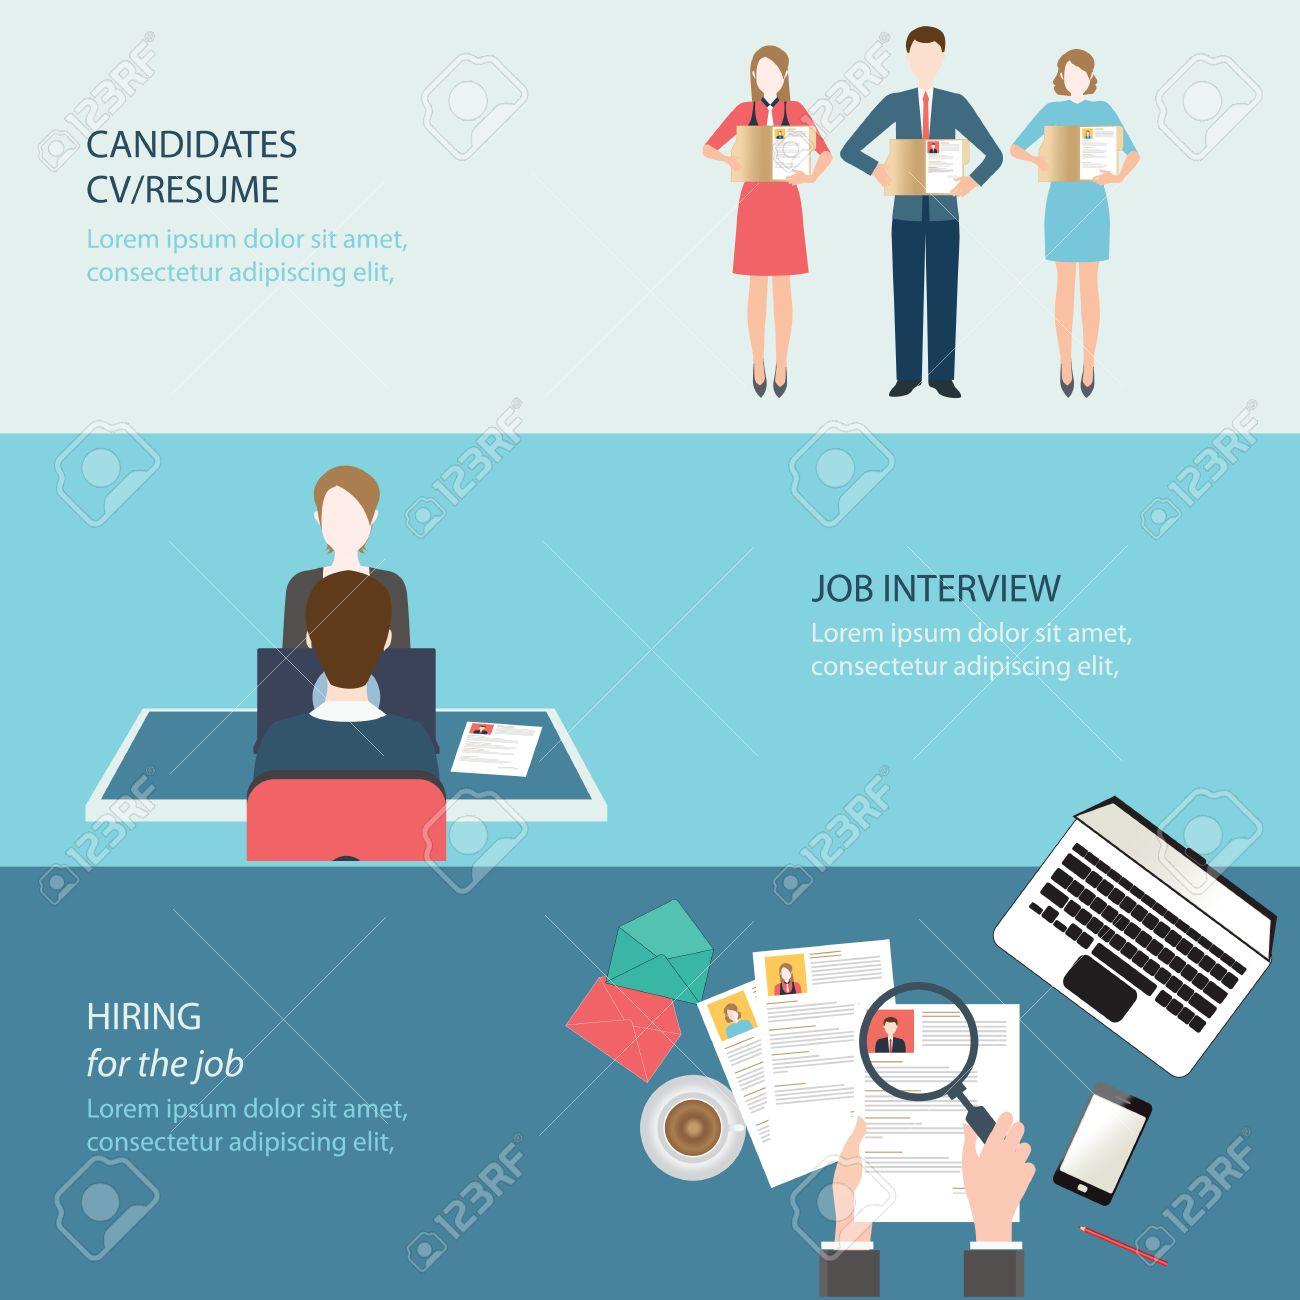 recruitment flat banner set job search job interview hired recruitment flat banner set job search job interview hired the job conceptual